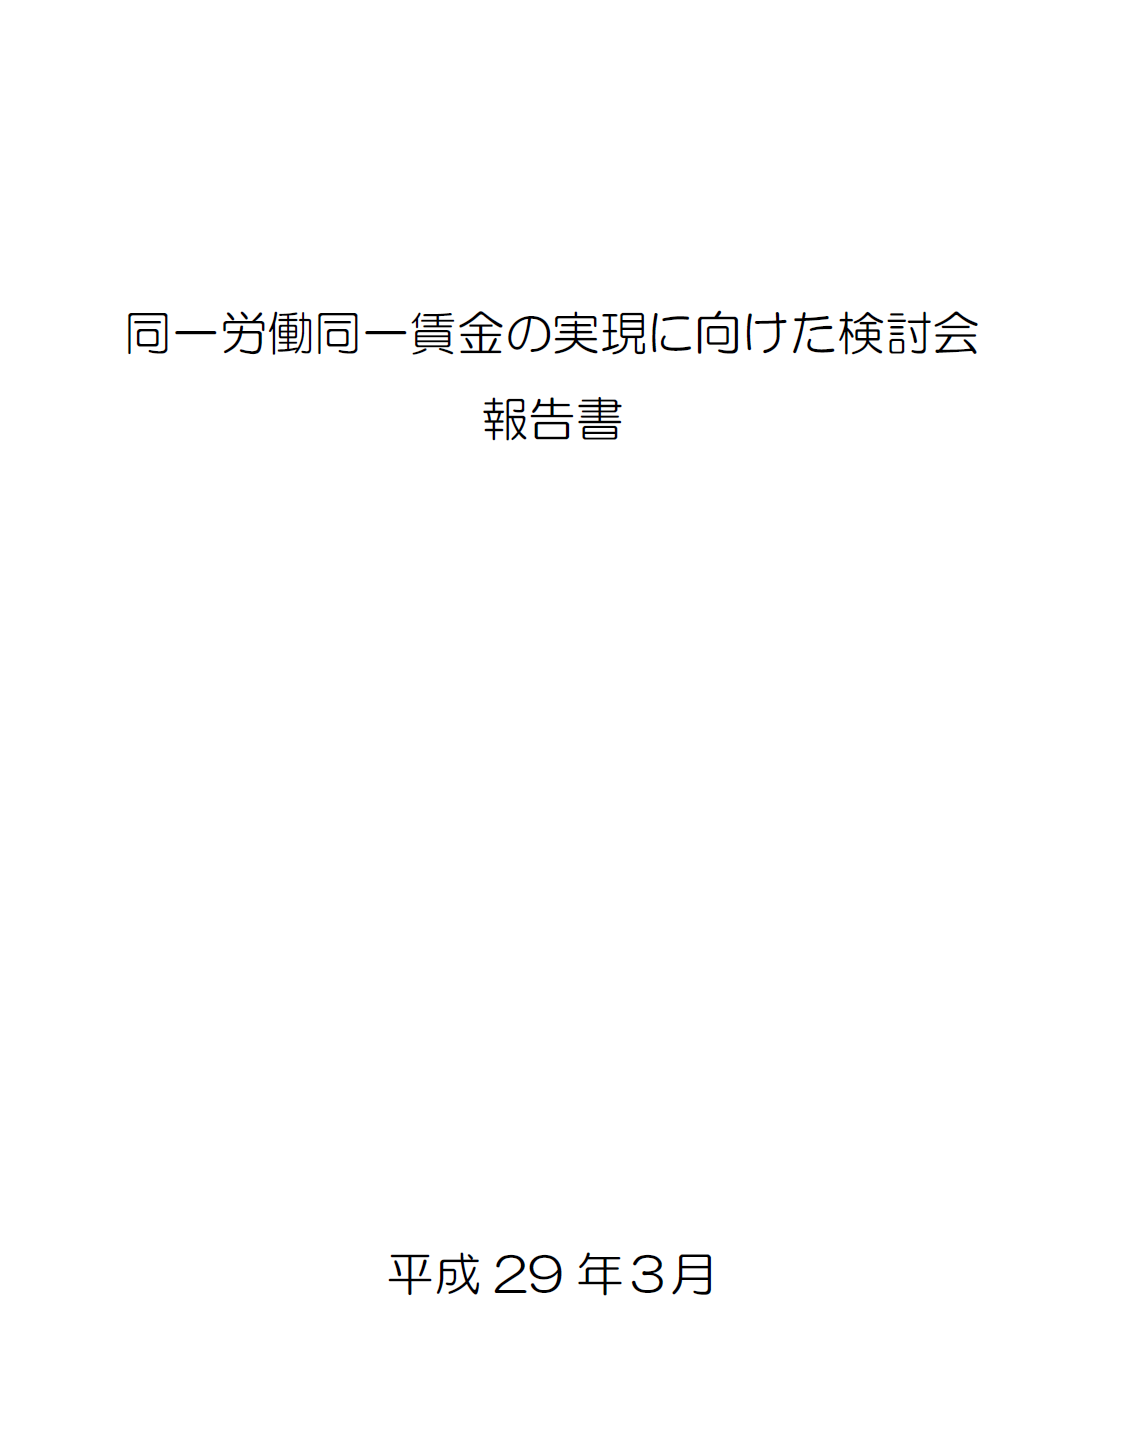 法案解説シリーズ(13)-学校教育法-